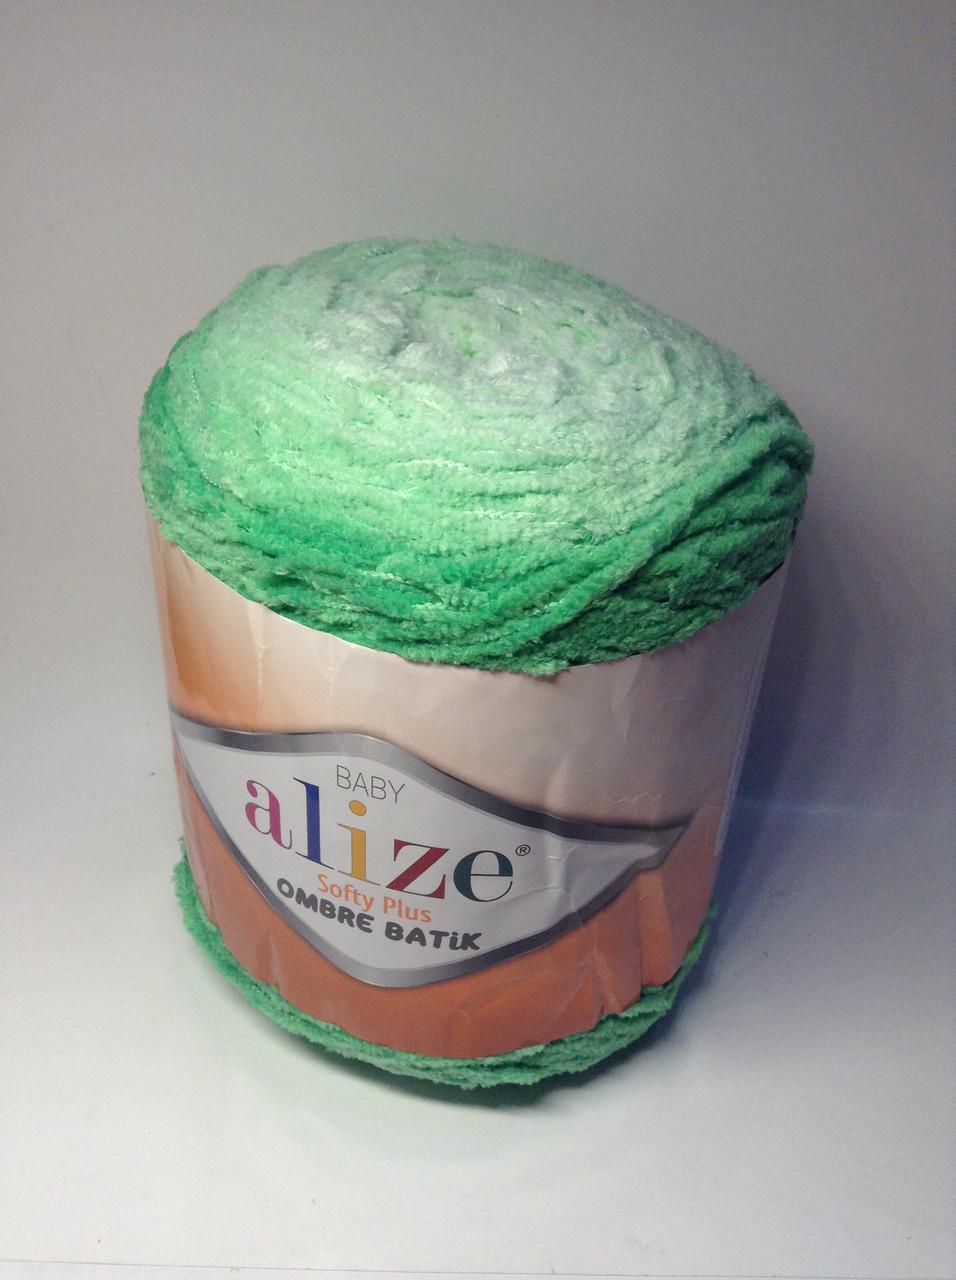 Пряжа  Softy plus ombre batik (плюшевая)